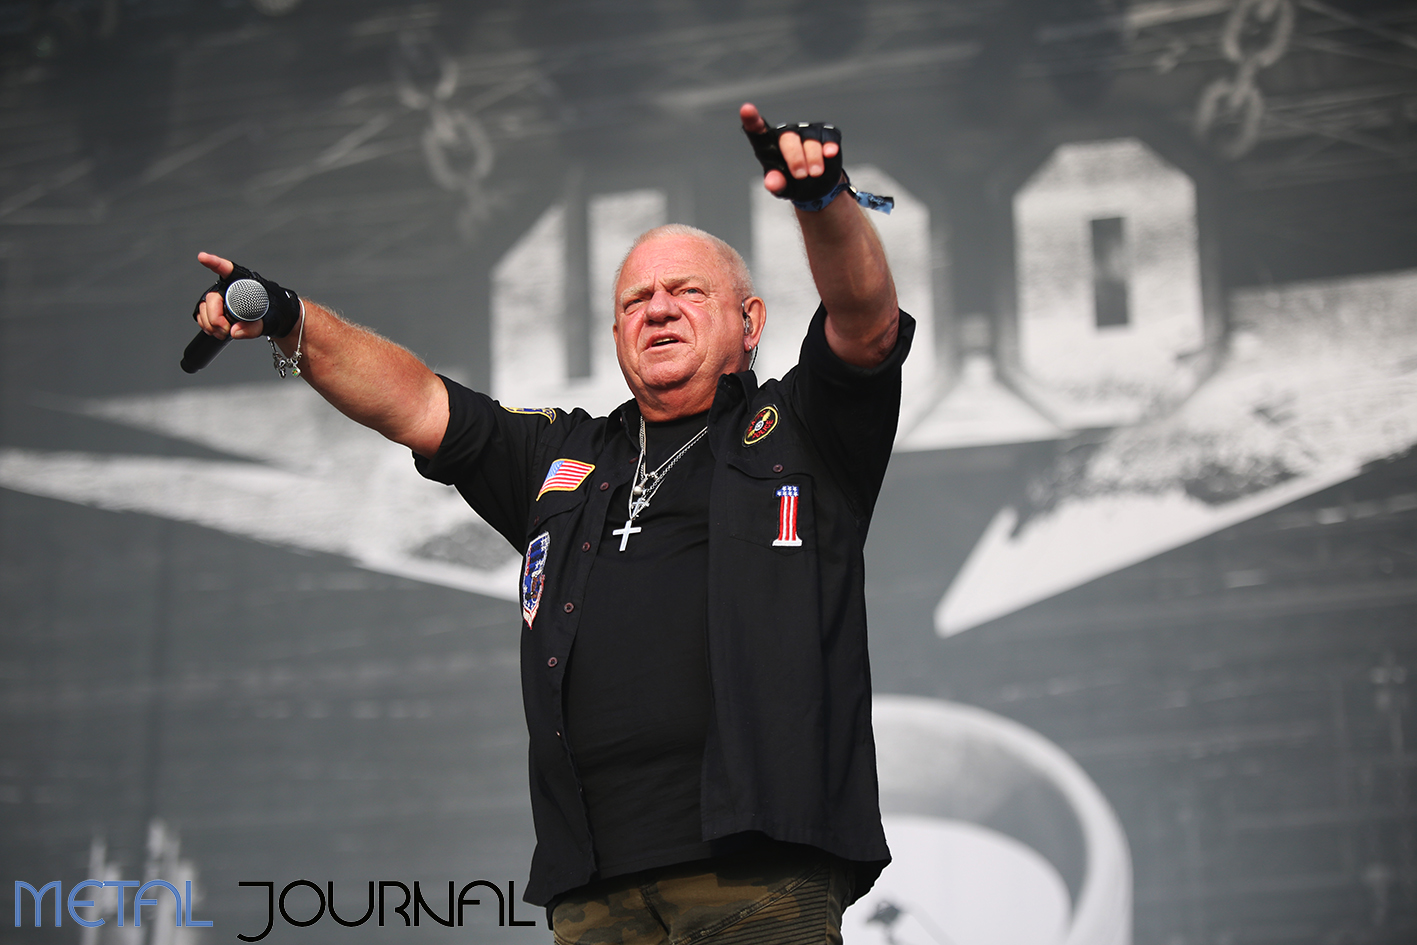 udo - metal journal rock fest barcelona 2019 pic 6